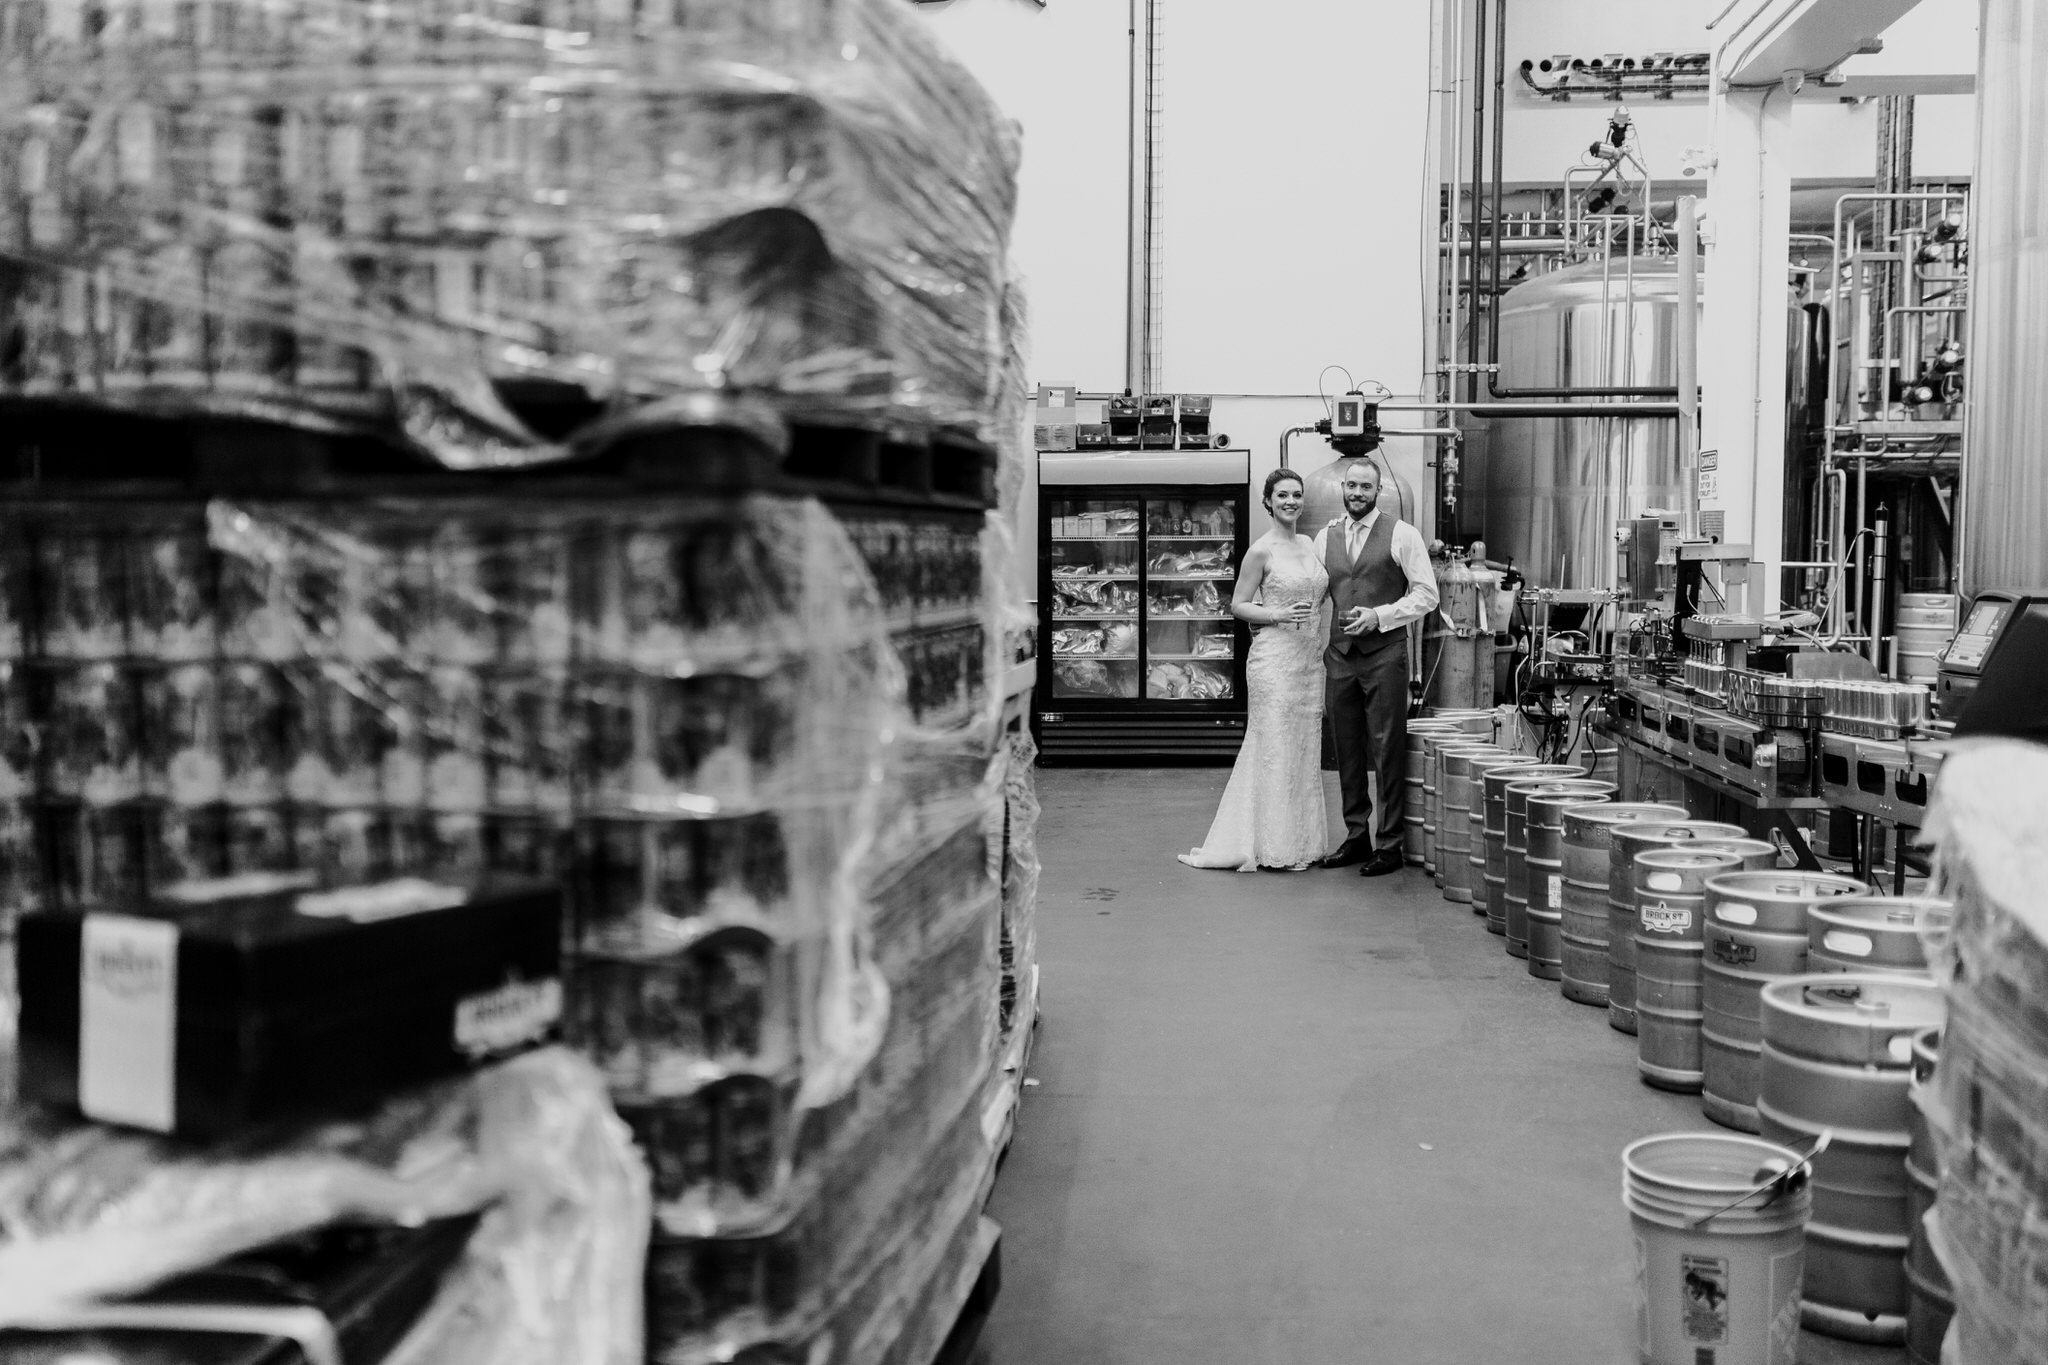 Brock Street Brewery Wedding - portraits in the brewery